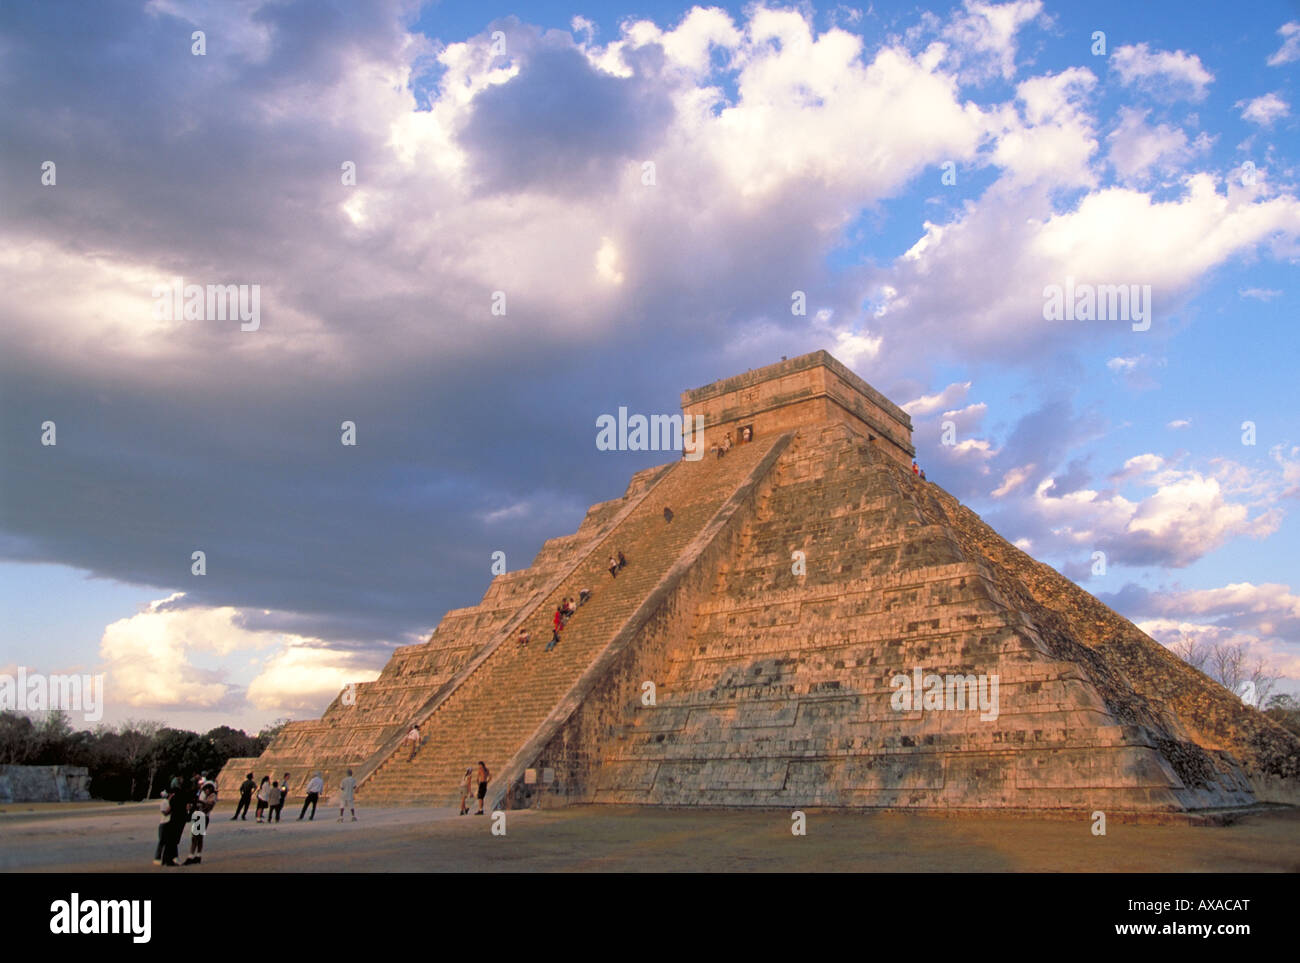 Elk156 1837 Mexico Yucatan Chichen Itza El Castillo Pyramid of Kukulcan Mayan Post Classic Toltec period 900-1200 - Stock Image